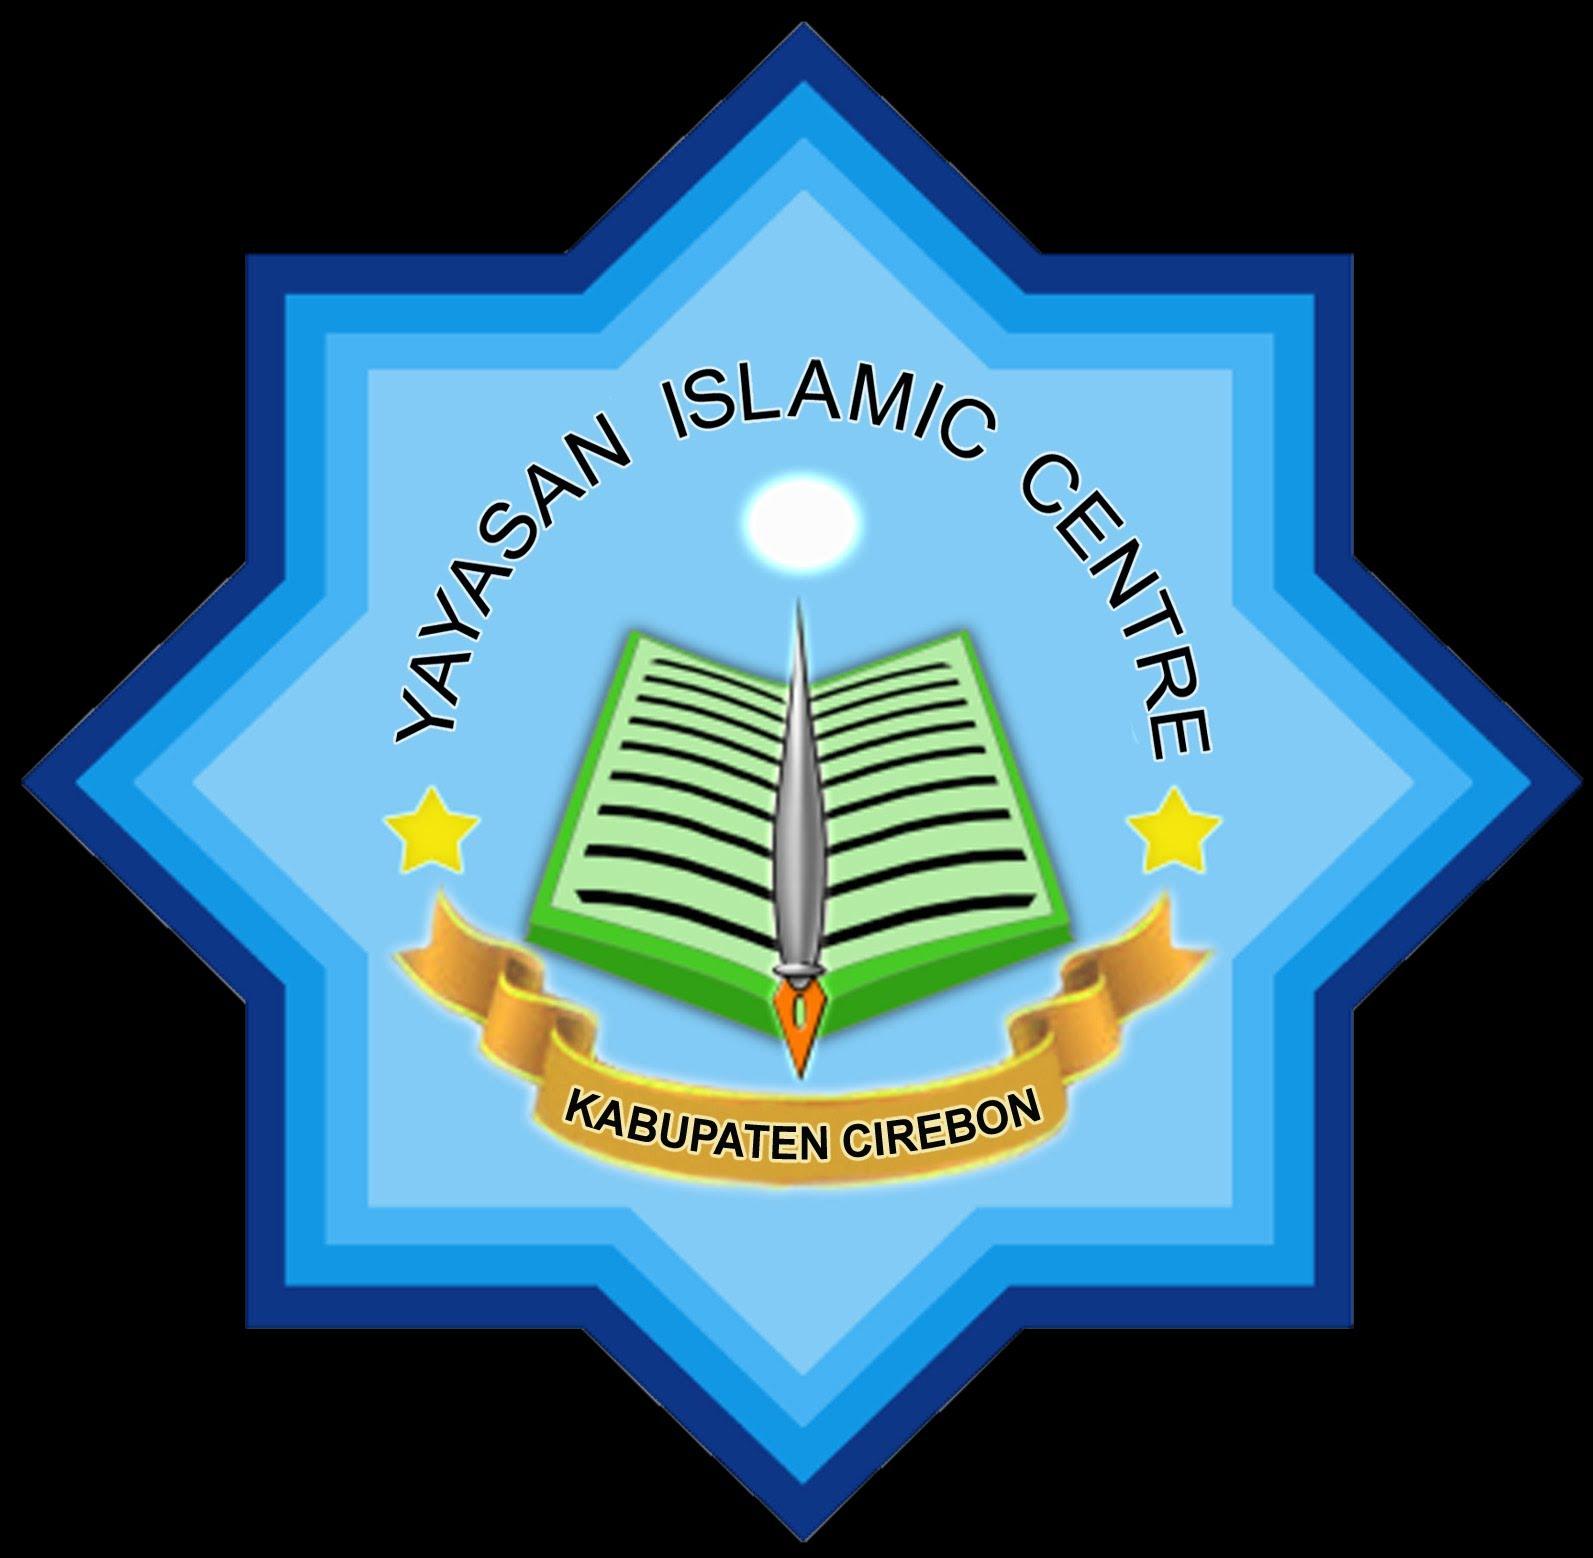 Islamic Centre Cirebon